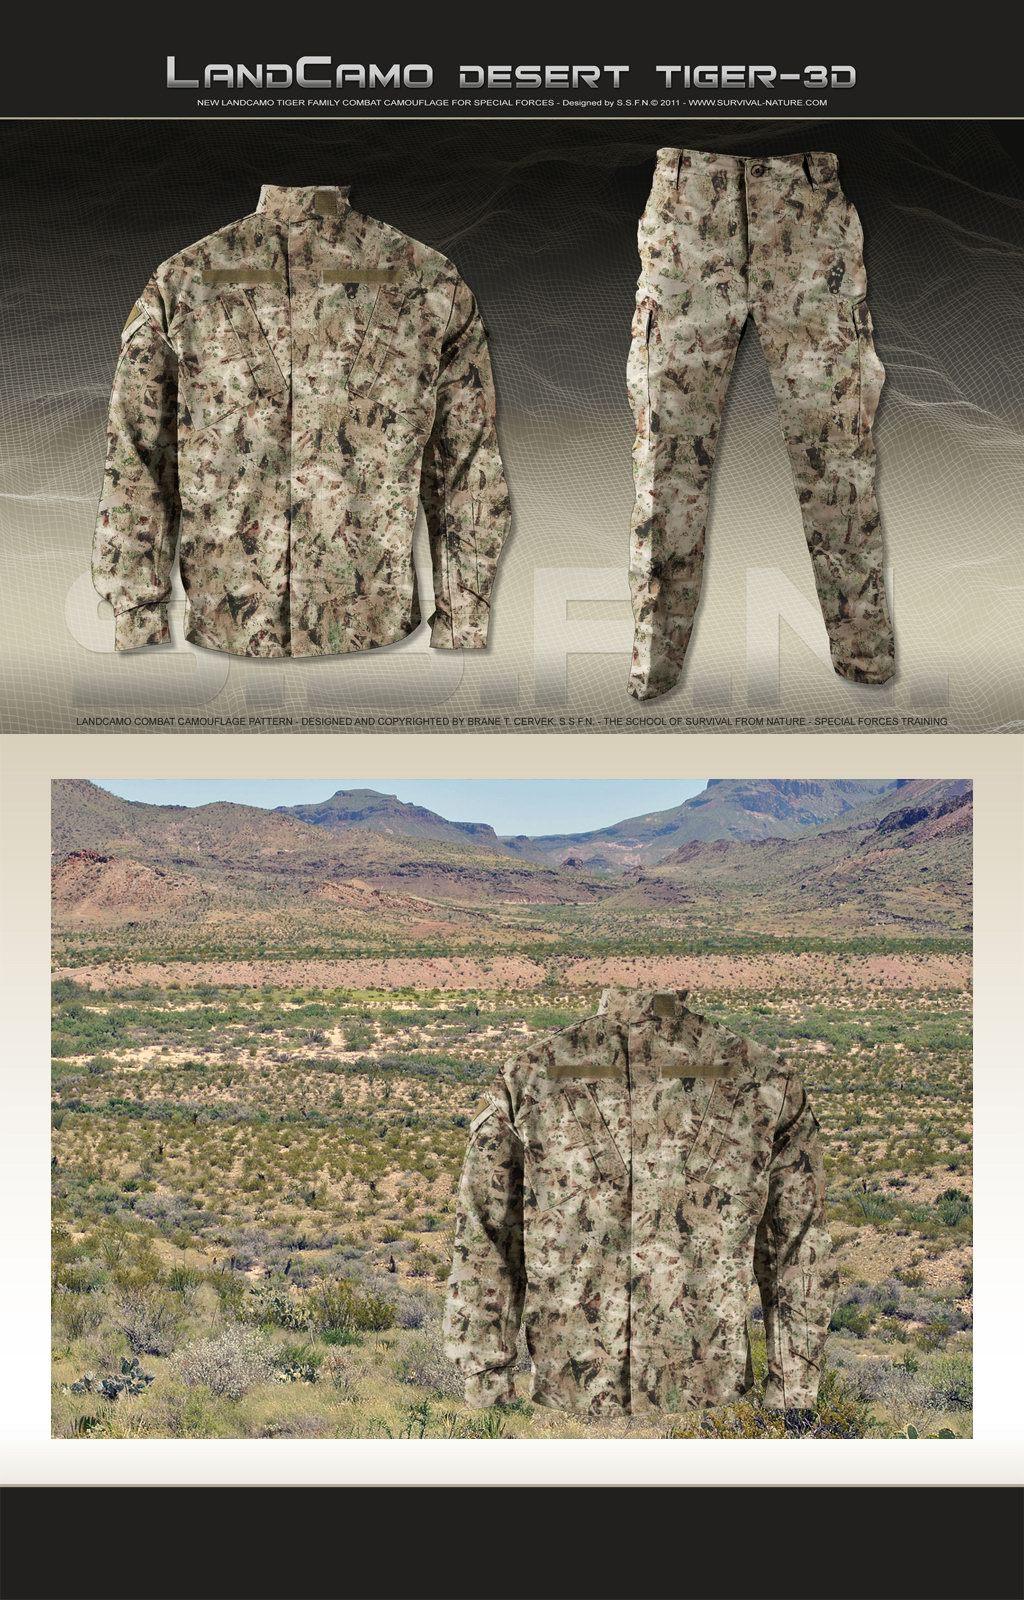 <!--:en-->SSFN ExtremePro LandCamo Terrain-Specific/Mission-Specific Digital Combat Camouflage Patterns <!--:-->